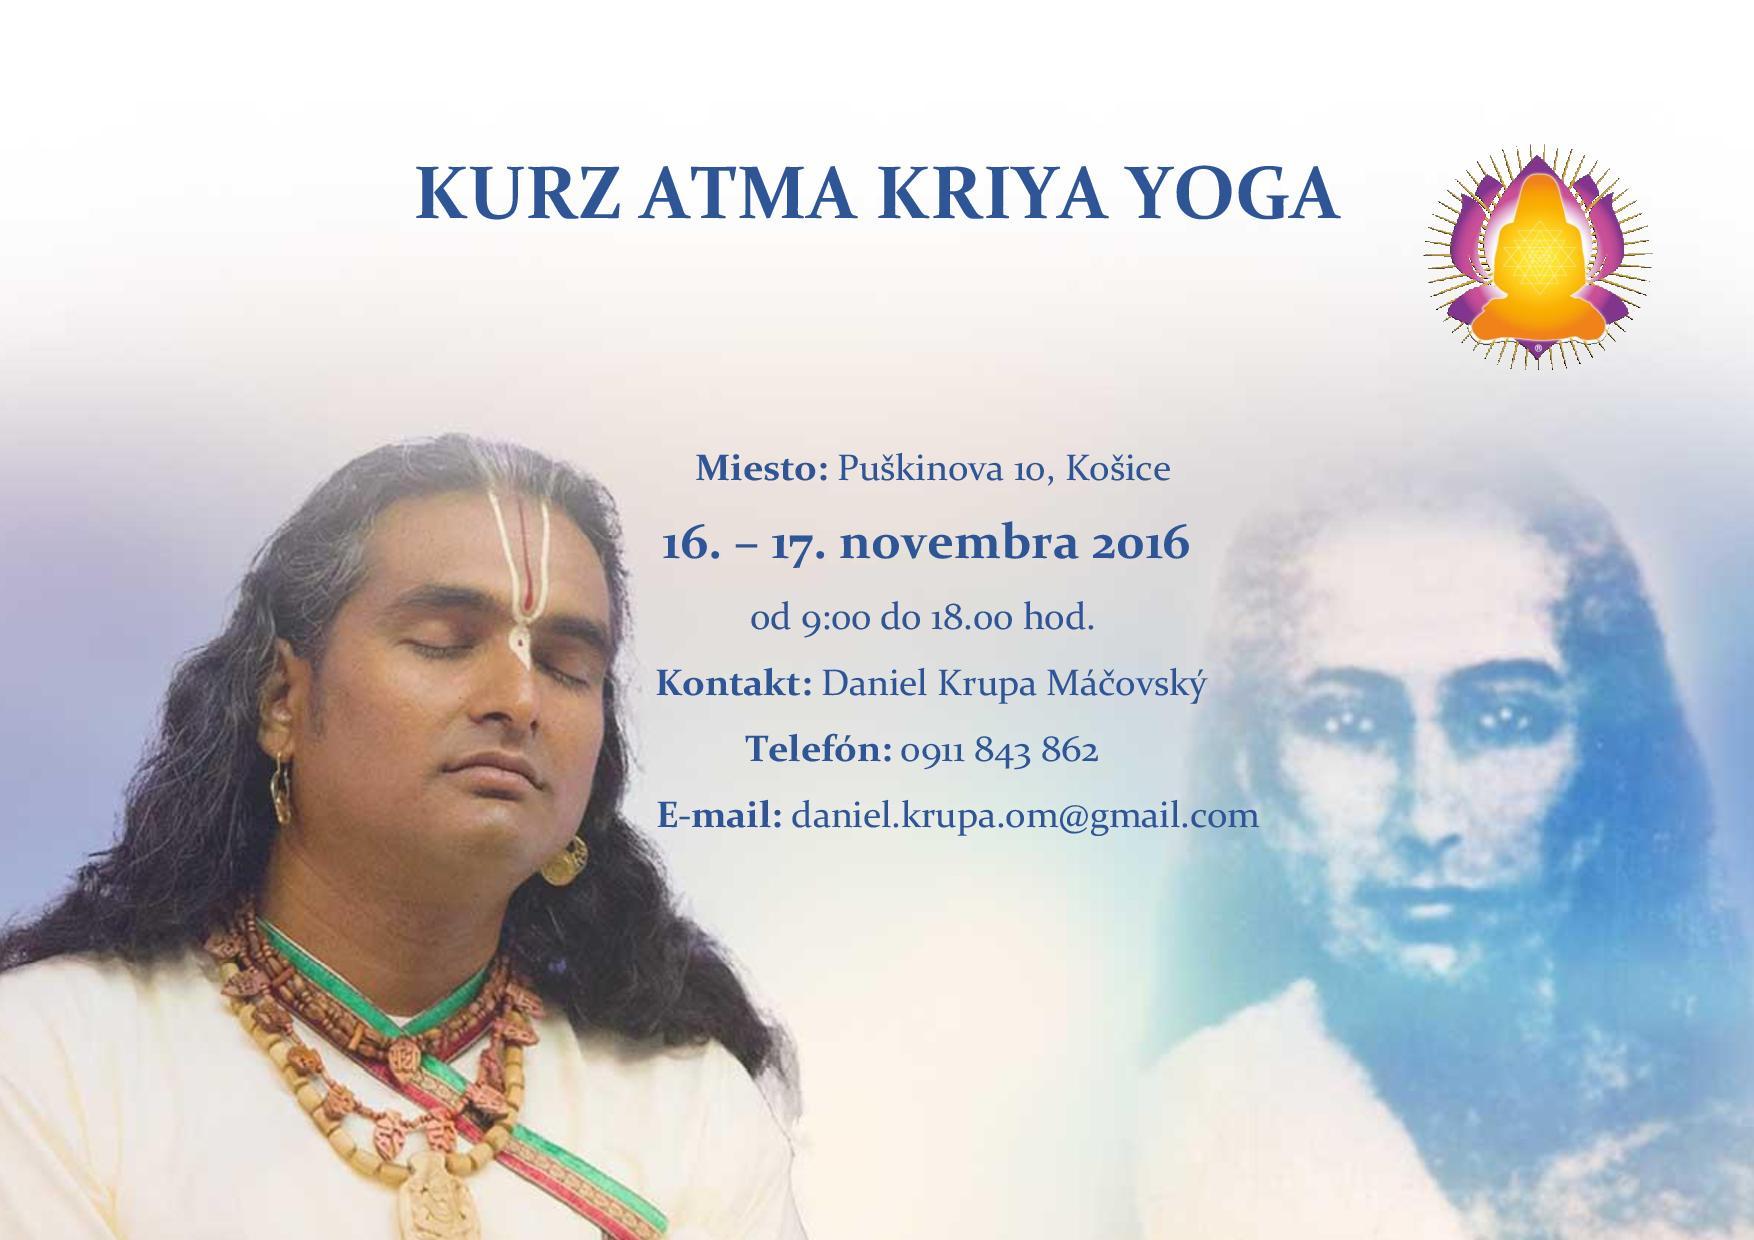 kurz-atma-kriya-yoga-page-001